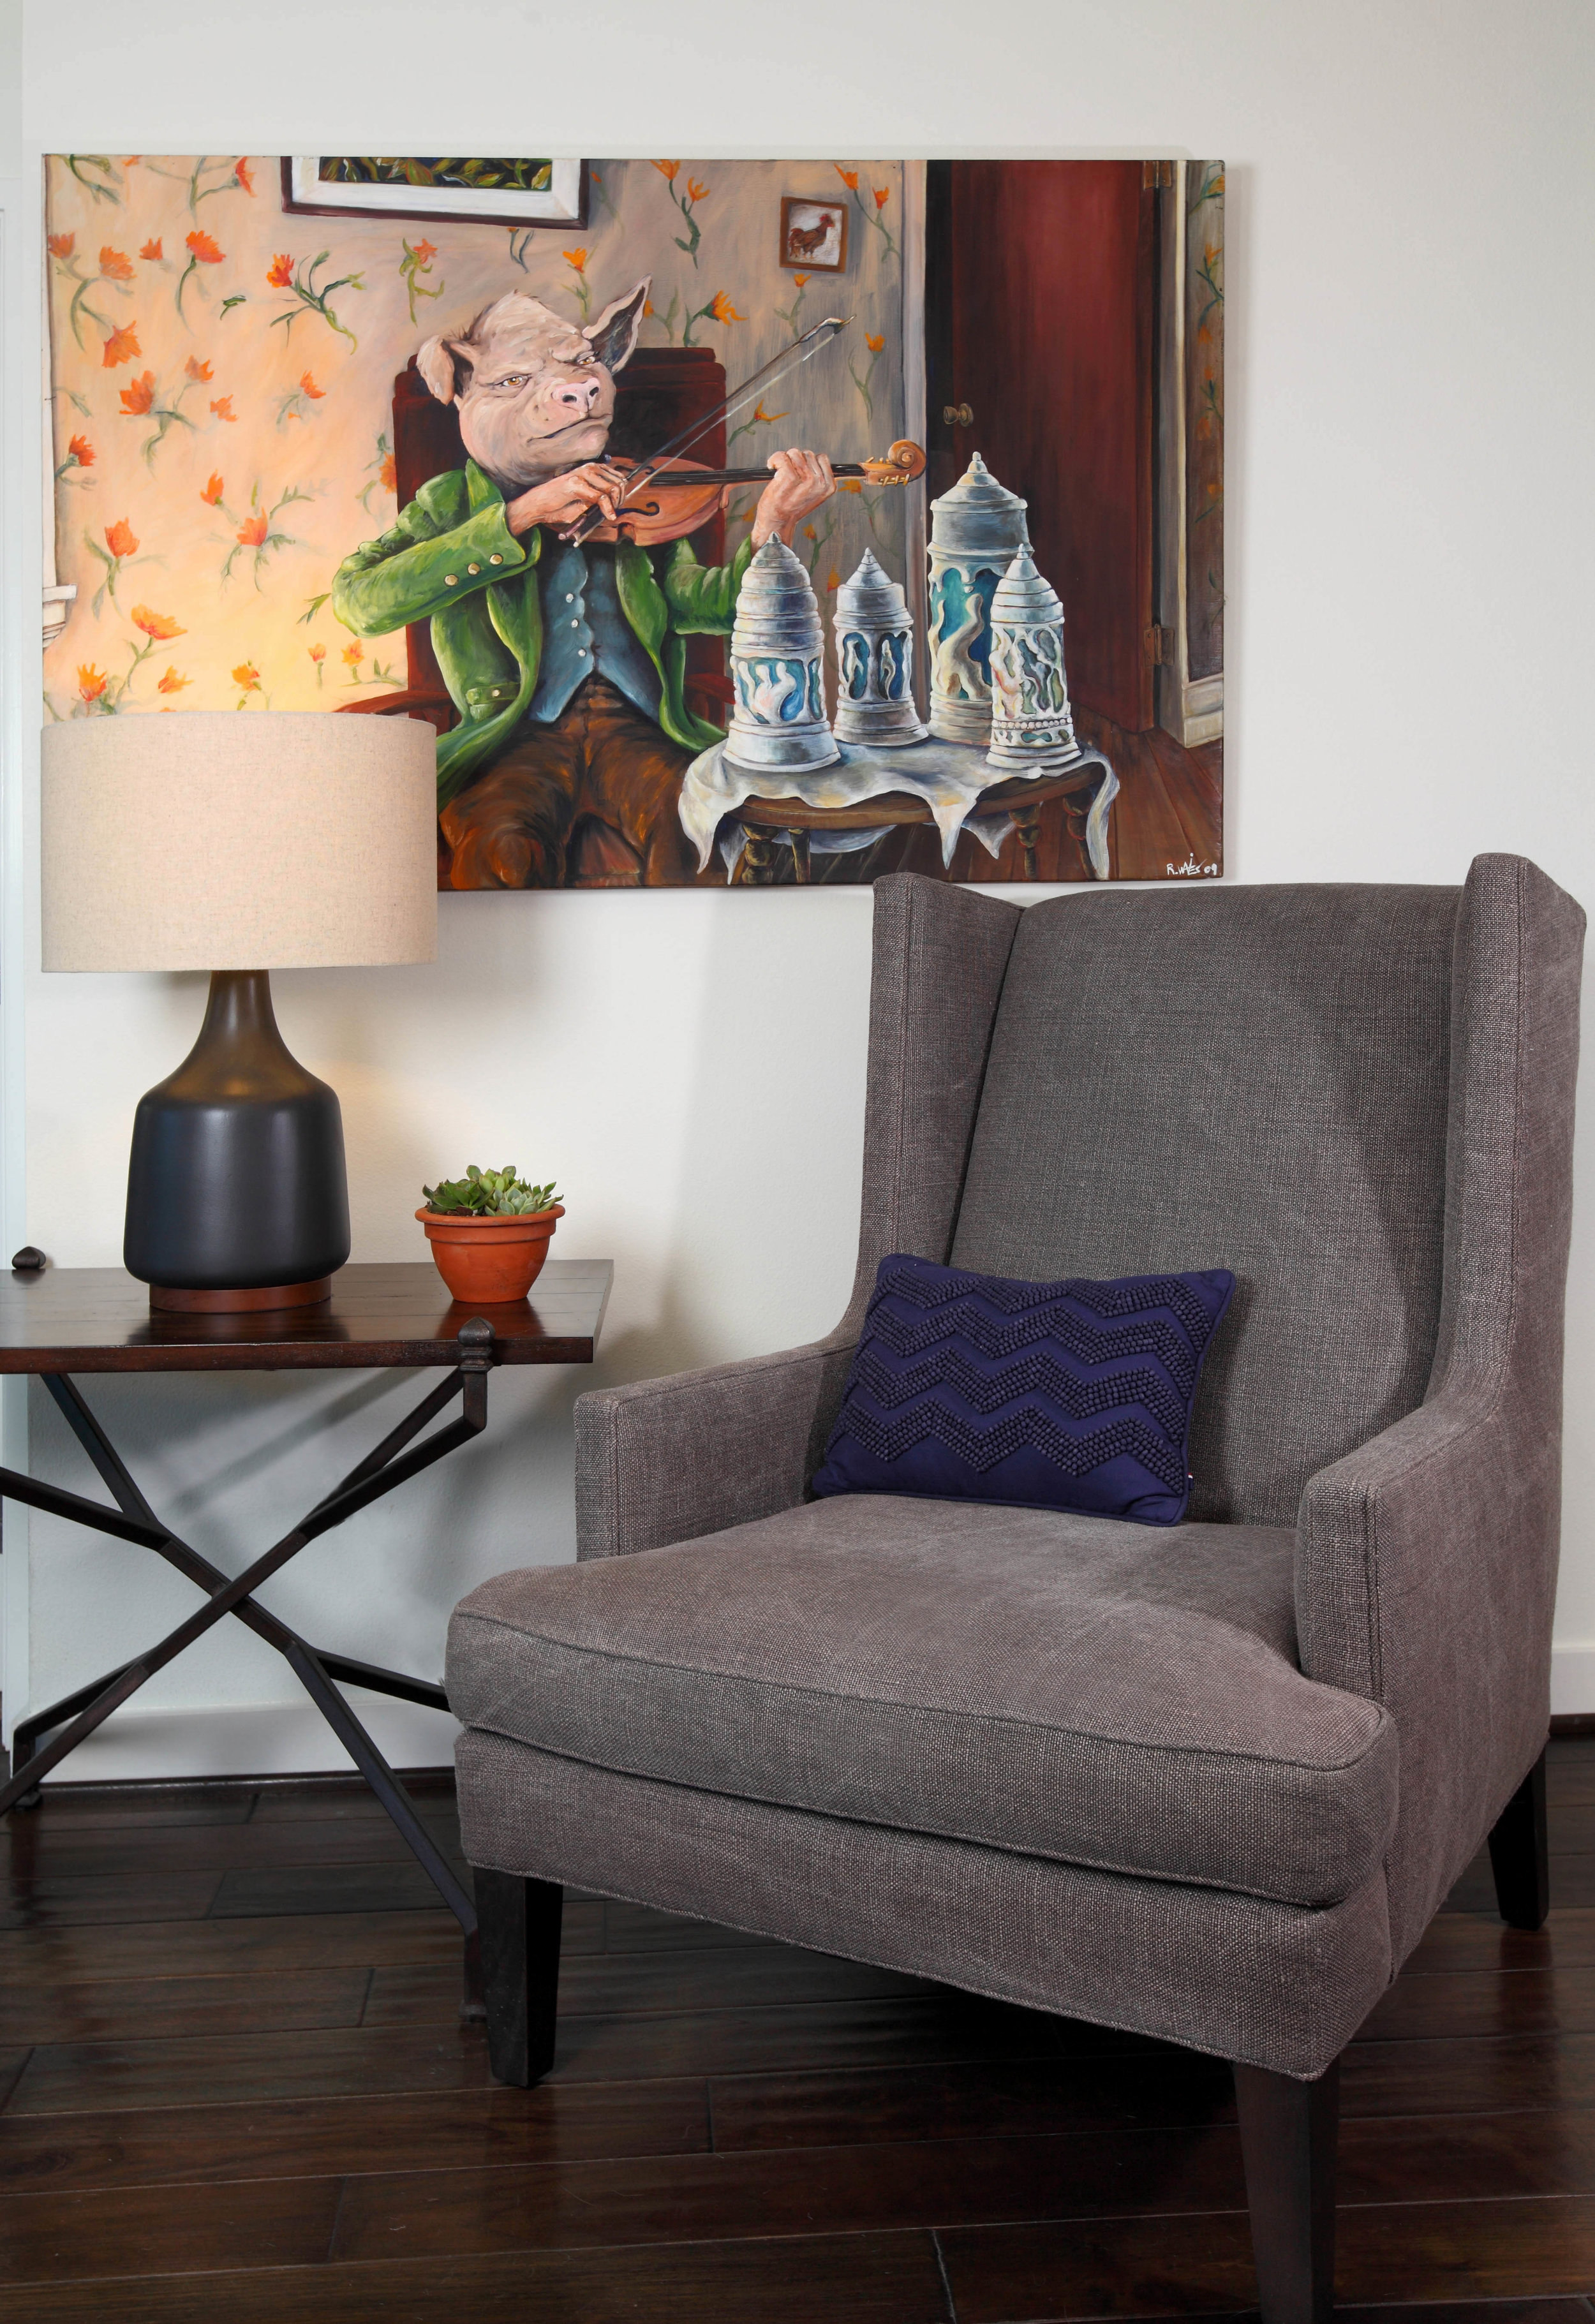 Sarah-barnard-design-modern-bachelorpad-armchair.jpg